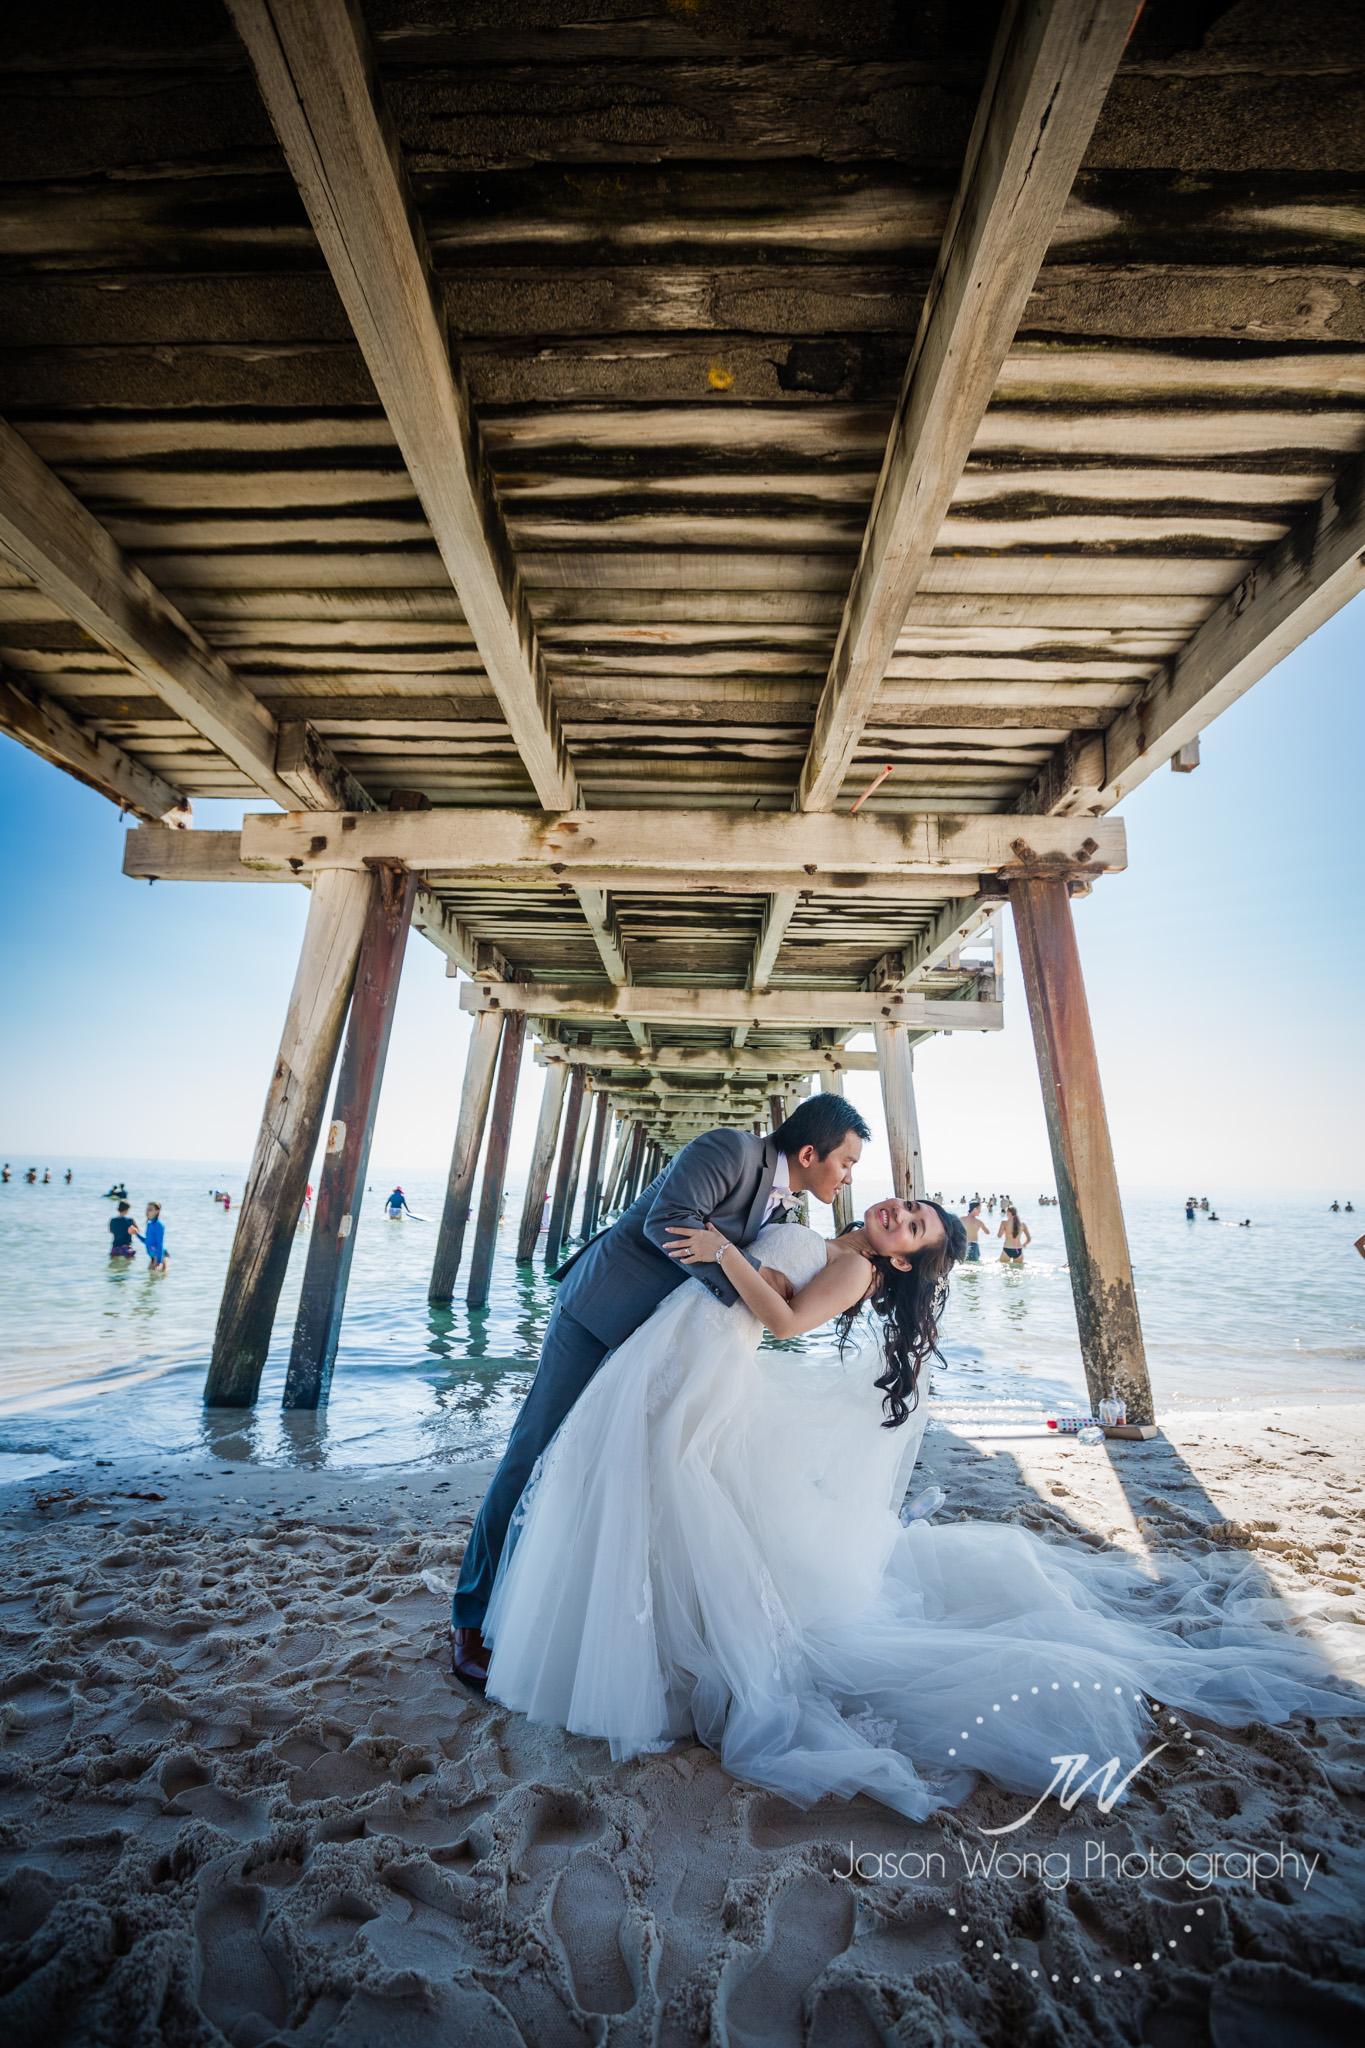 henley-beach-bride-and-groom-having-fun.jpg